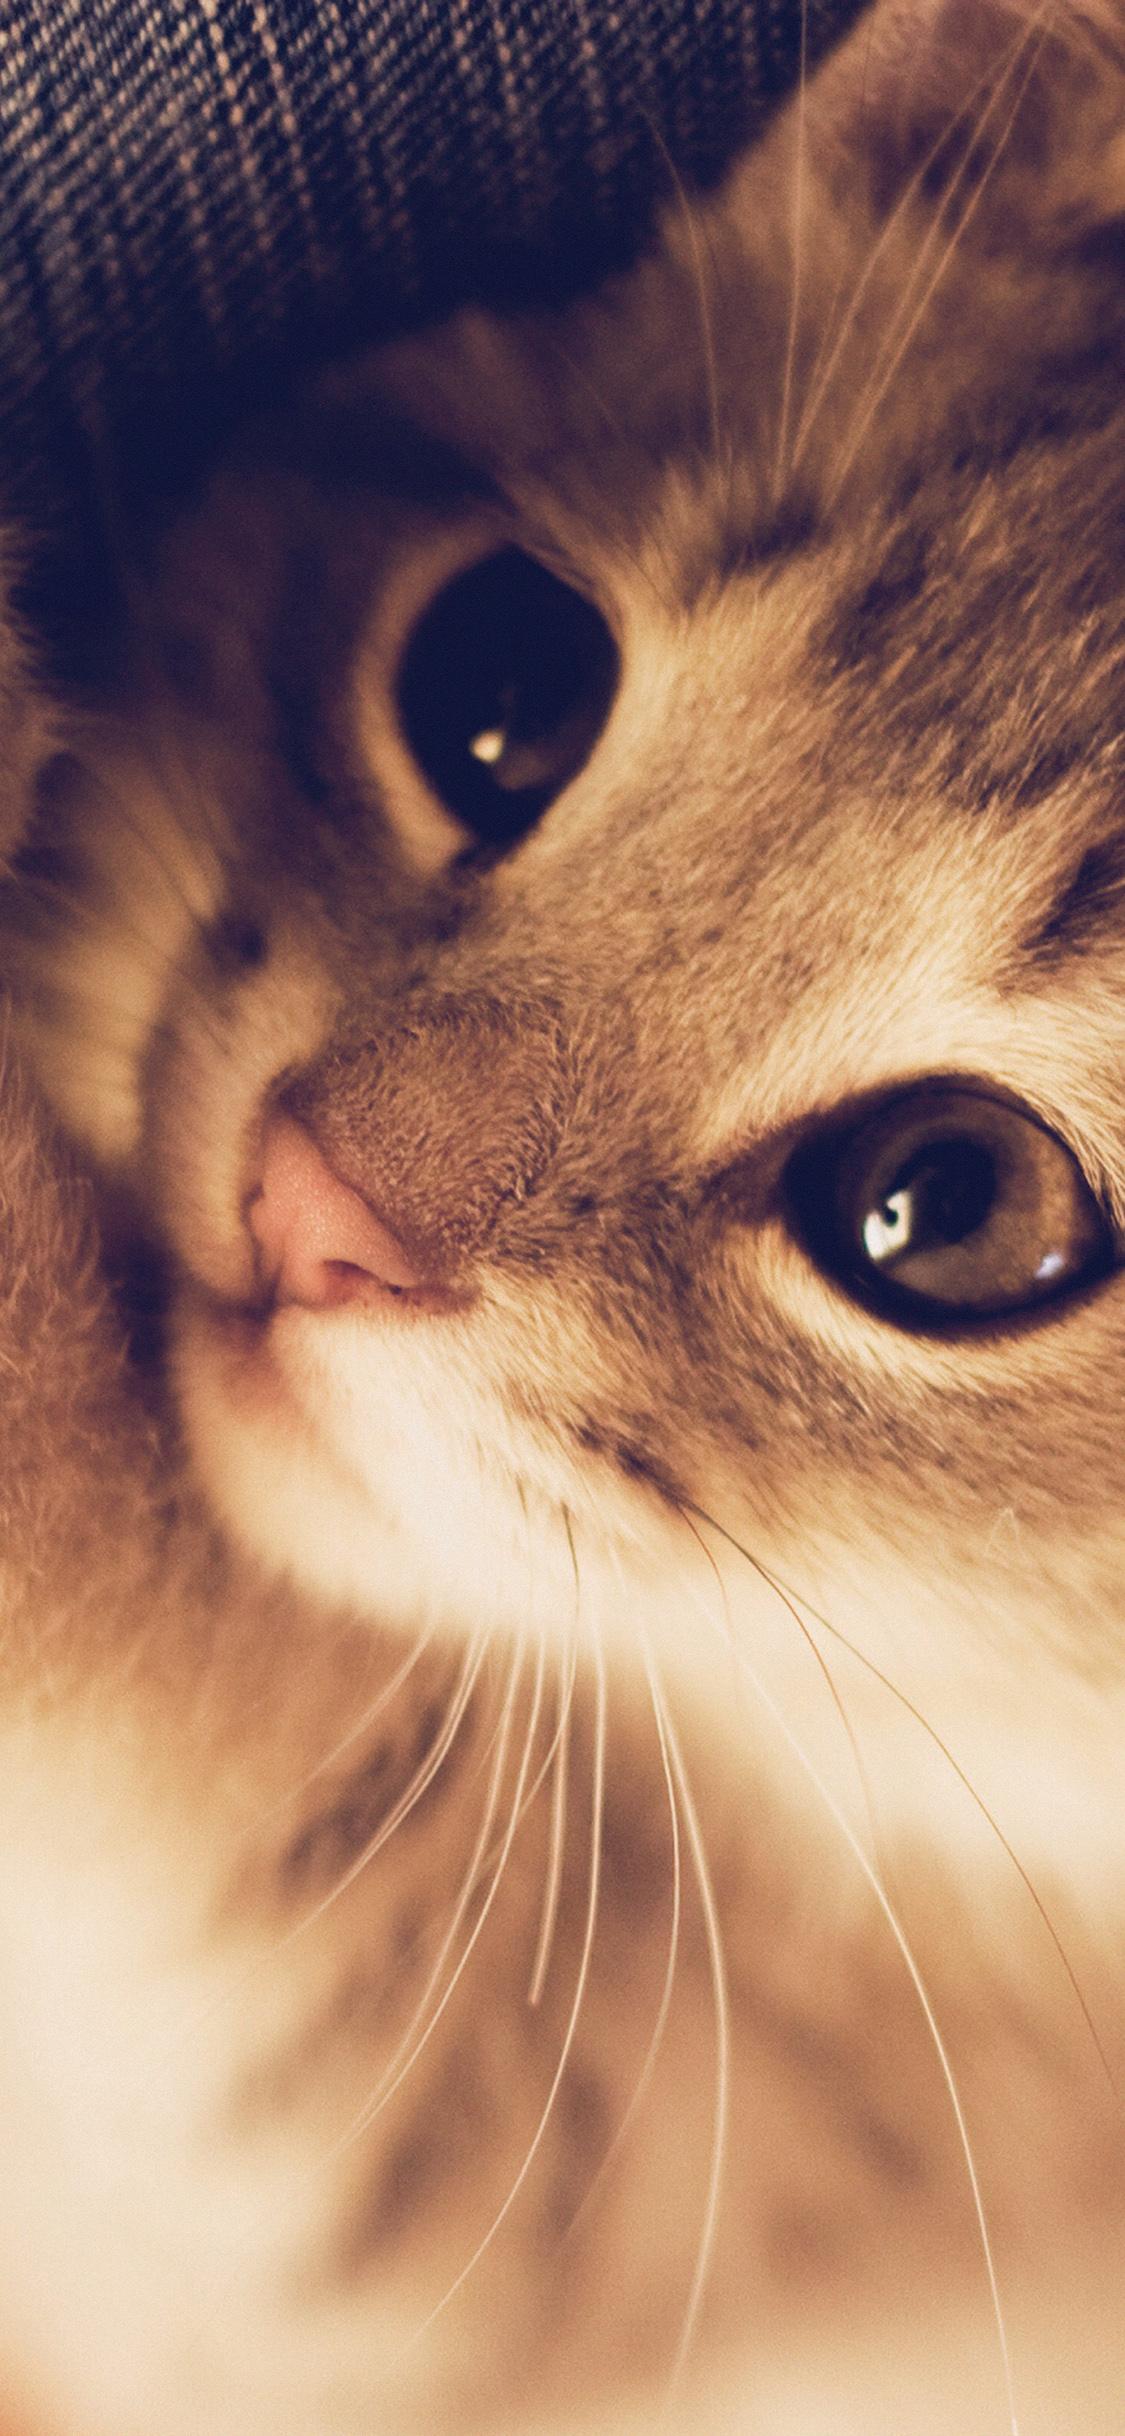 Iphonexpapers Mq77 Cute Cat Kitten Nature Animal